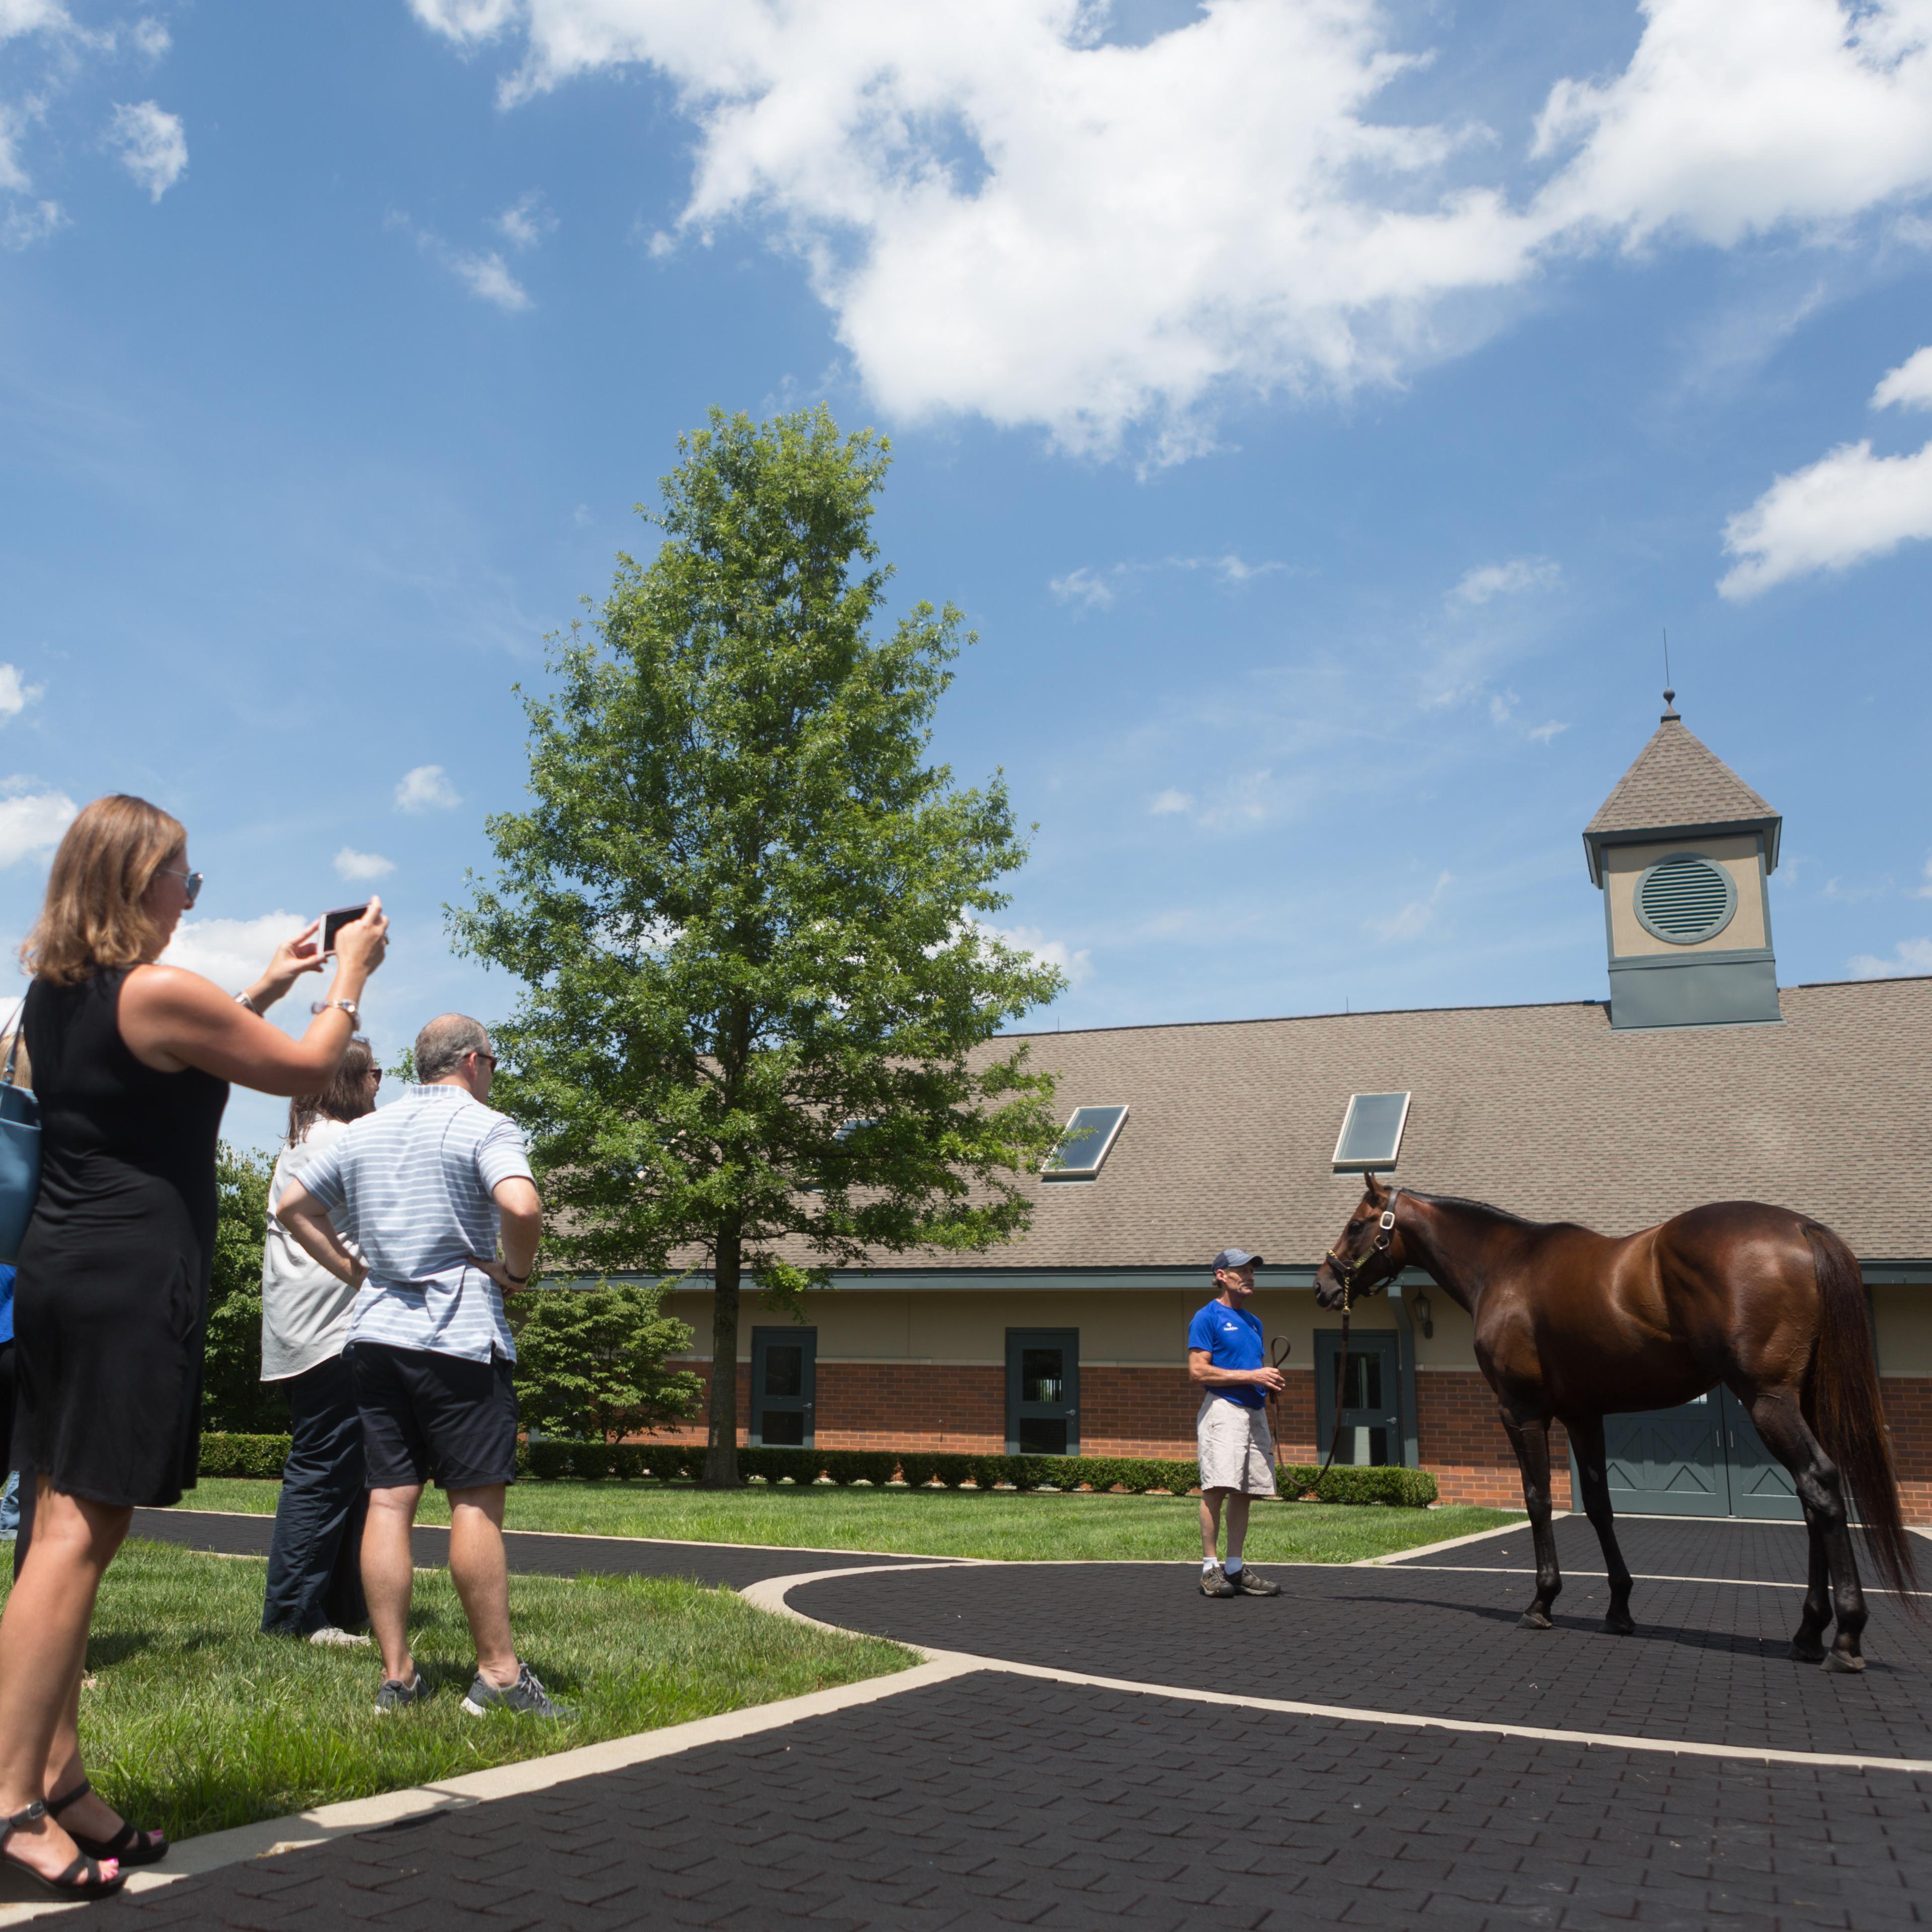 Horse Tour at Keeneland National Historic Landmark